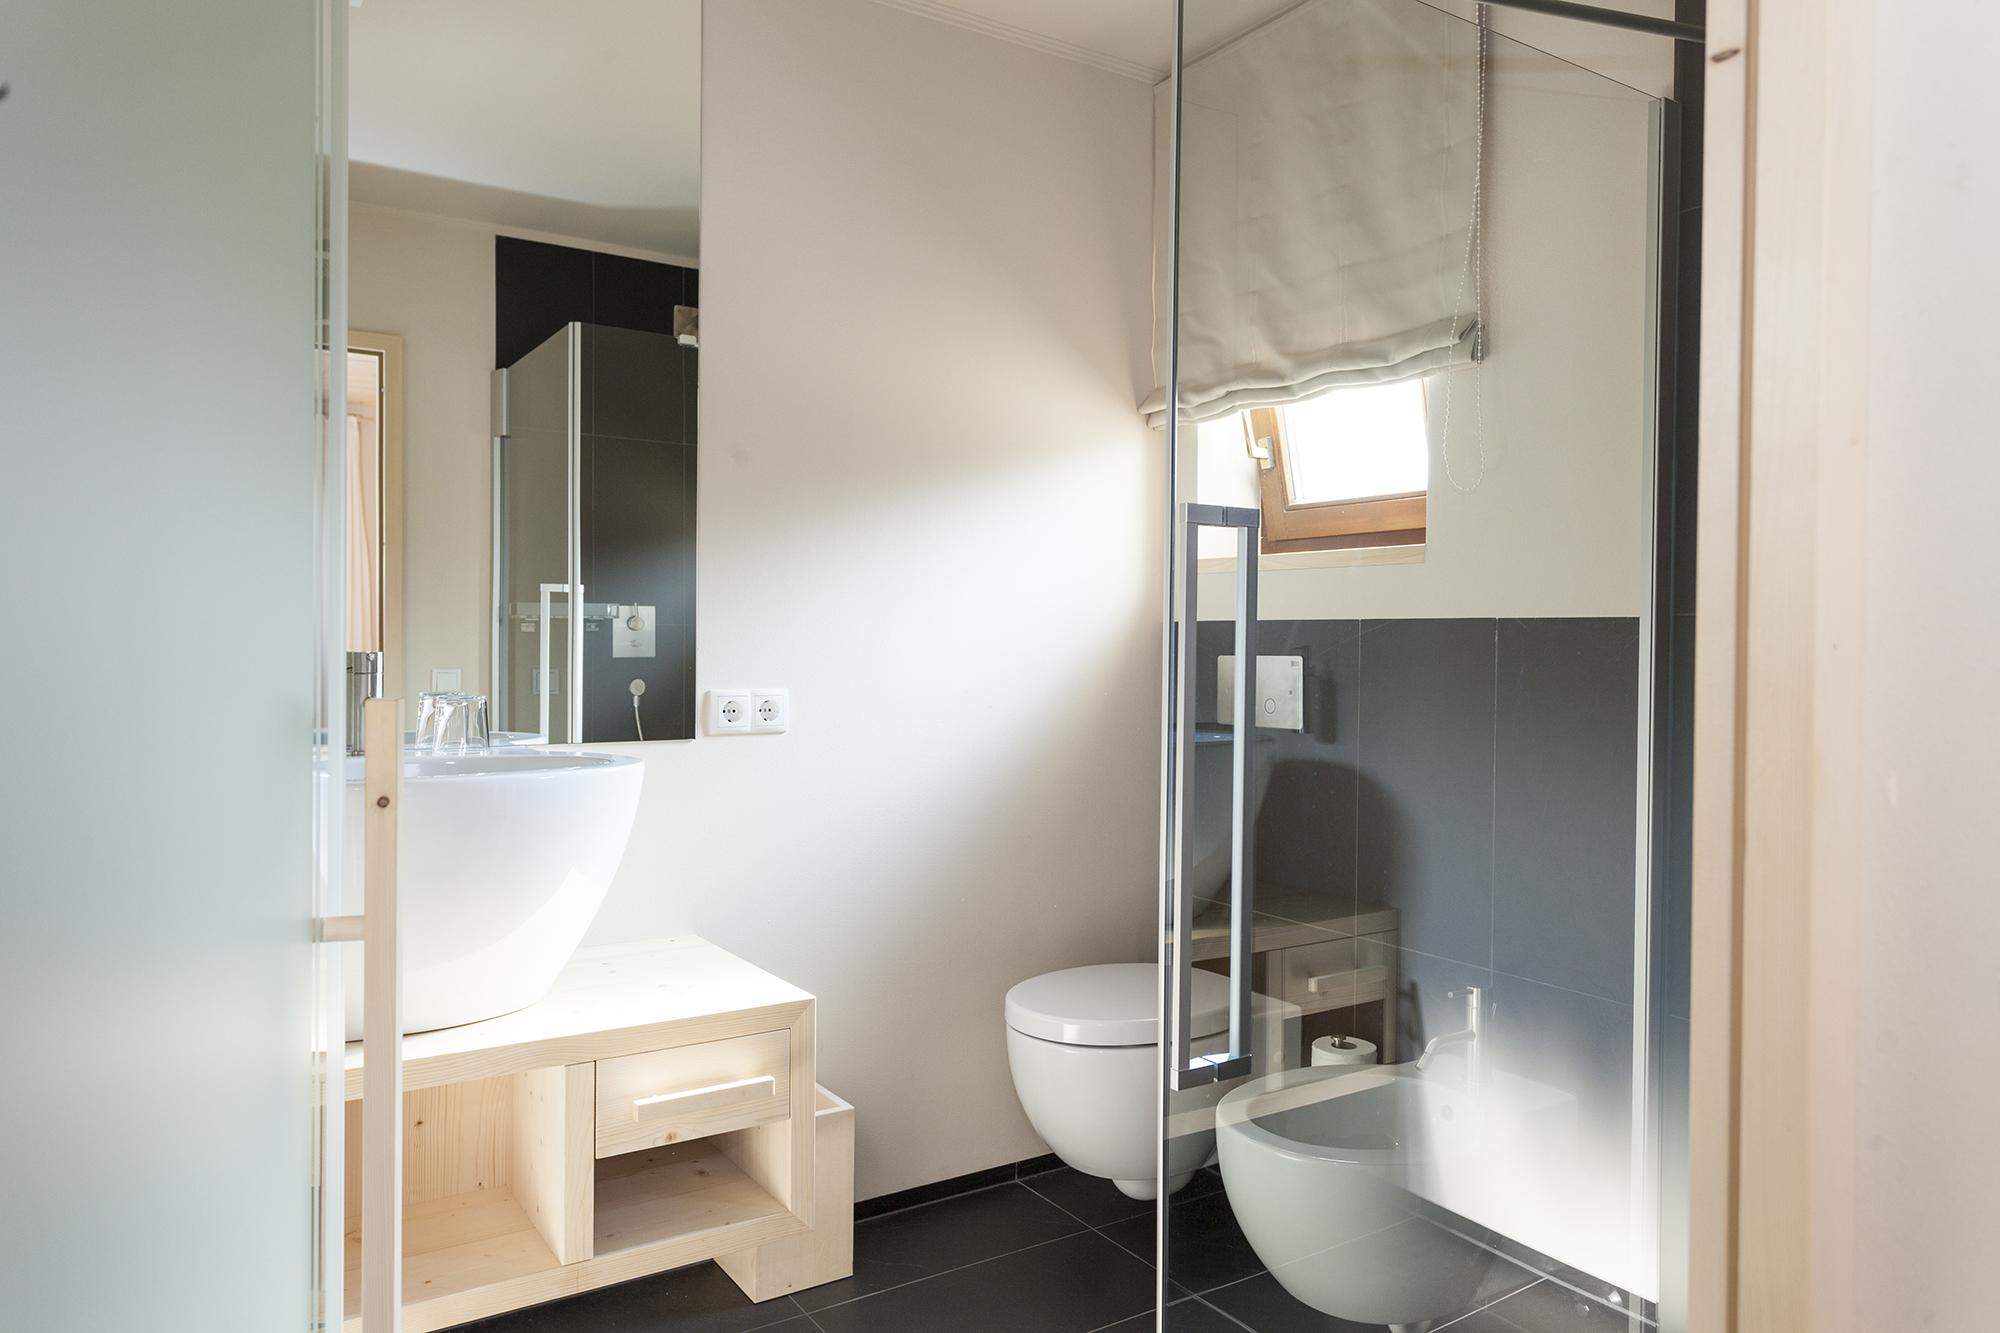 hotel-mayr-bathroom-washbasin-toilet